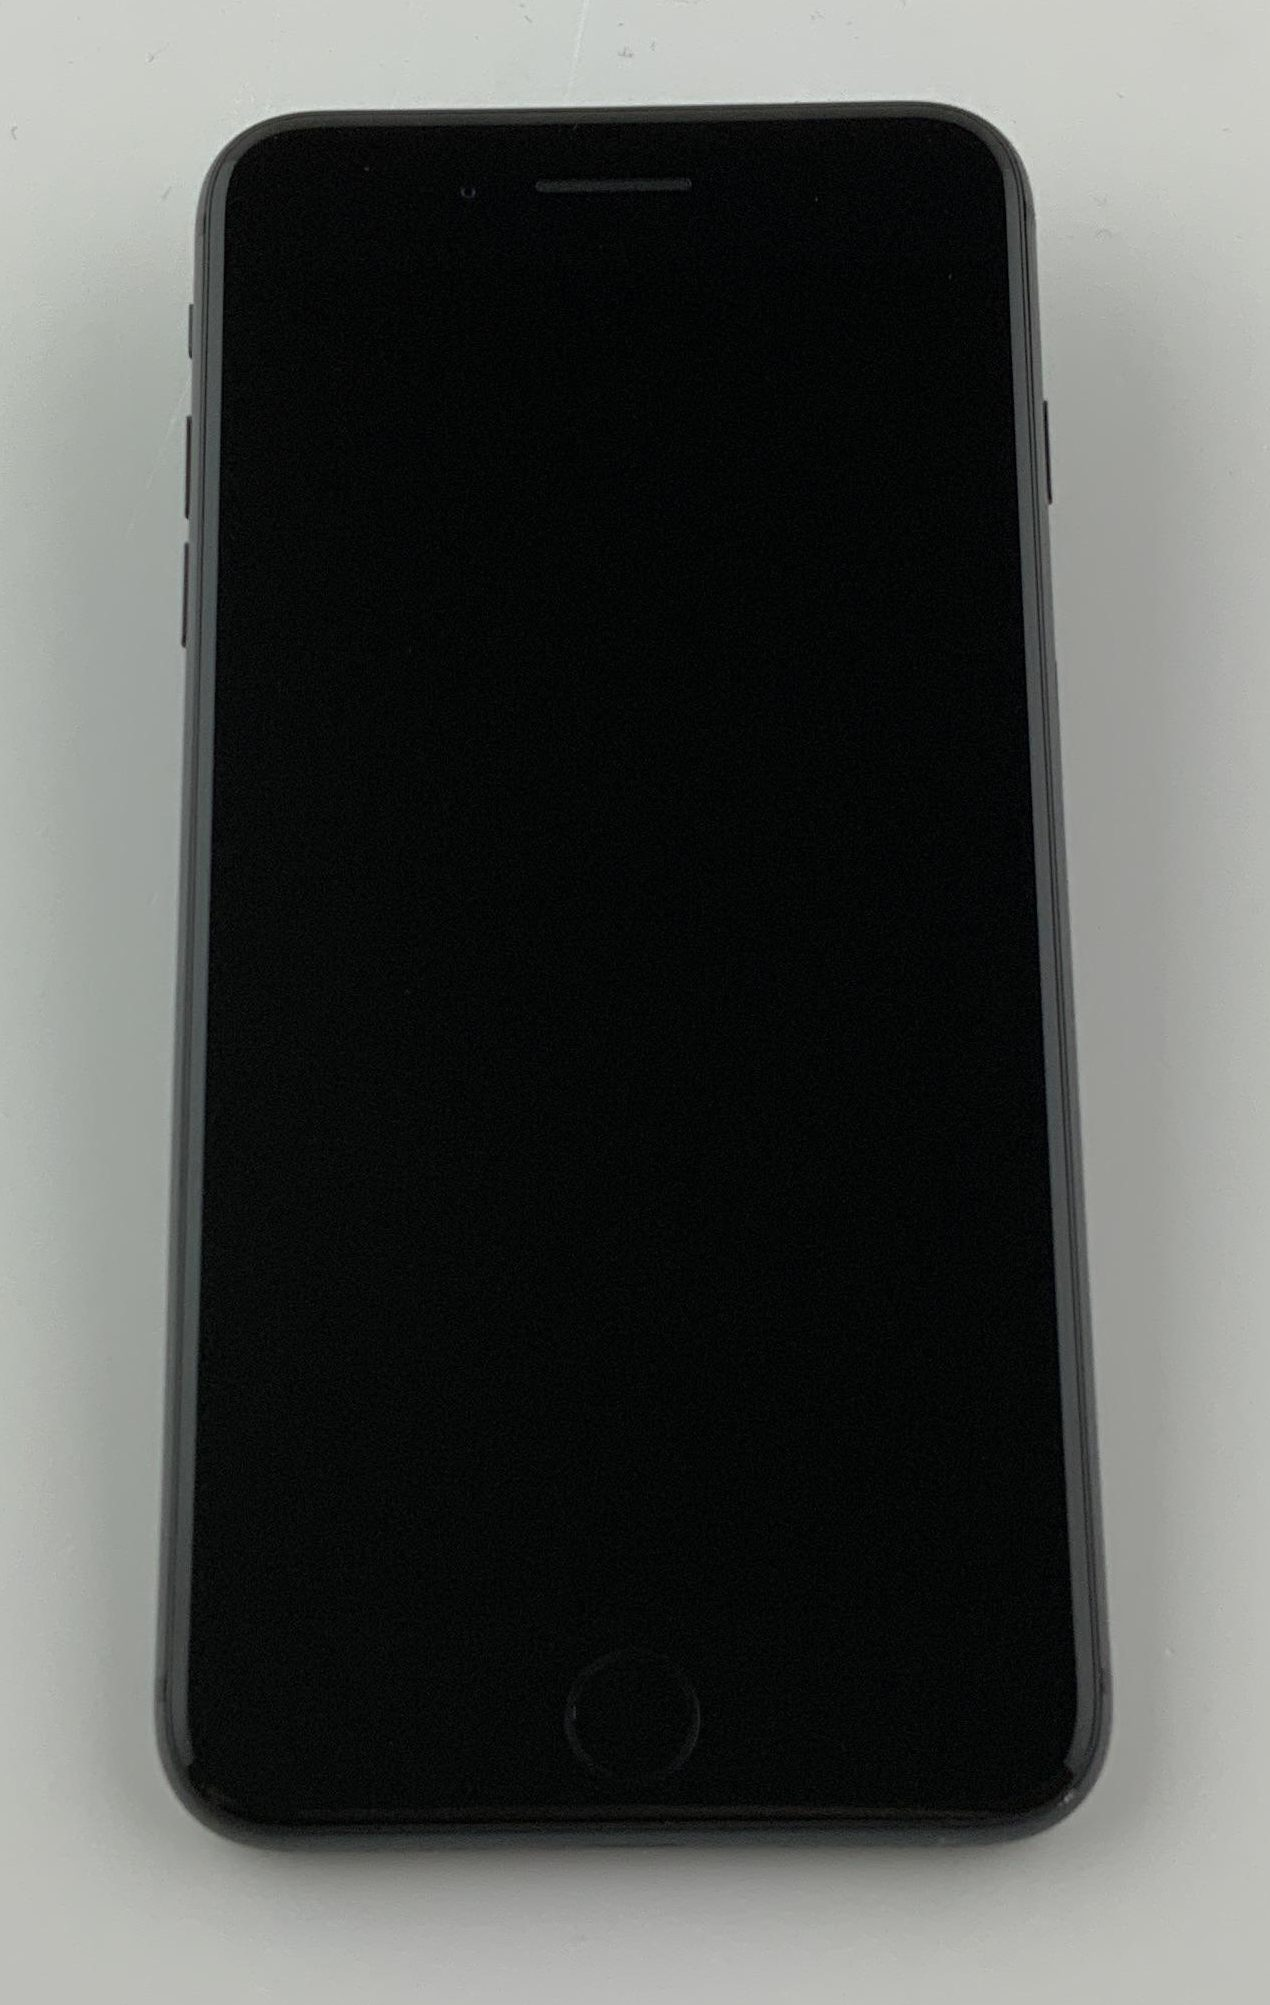 iPhone 8 Plus 256GB, 256GB, Space Gray, image 1